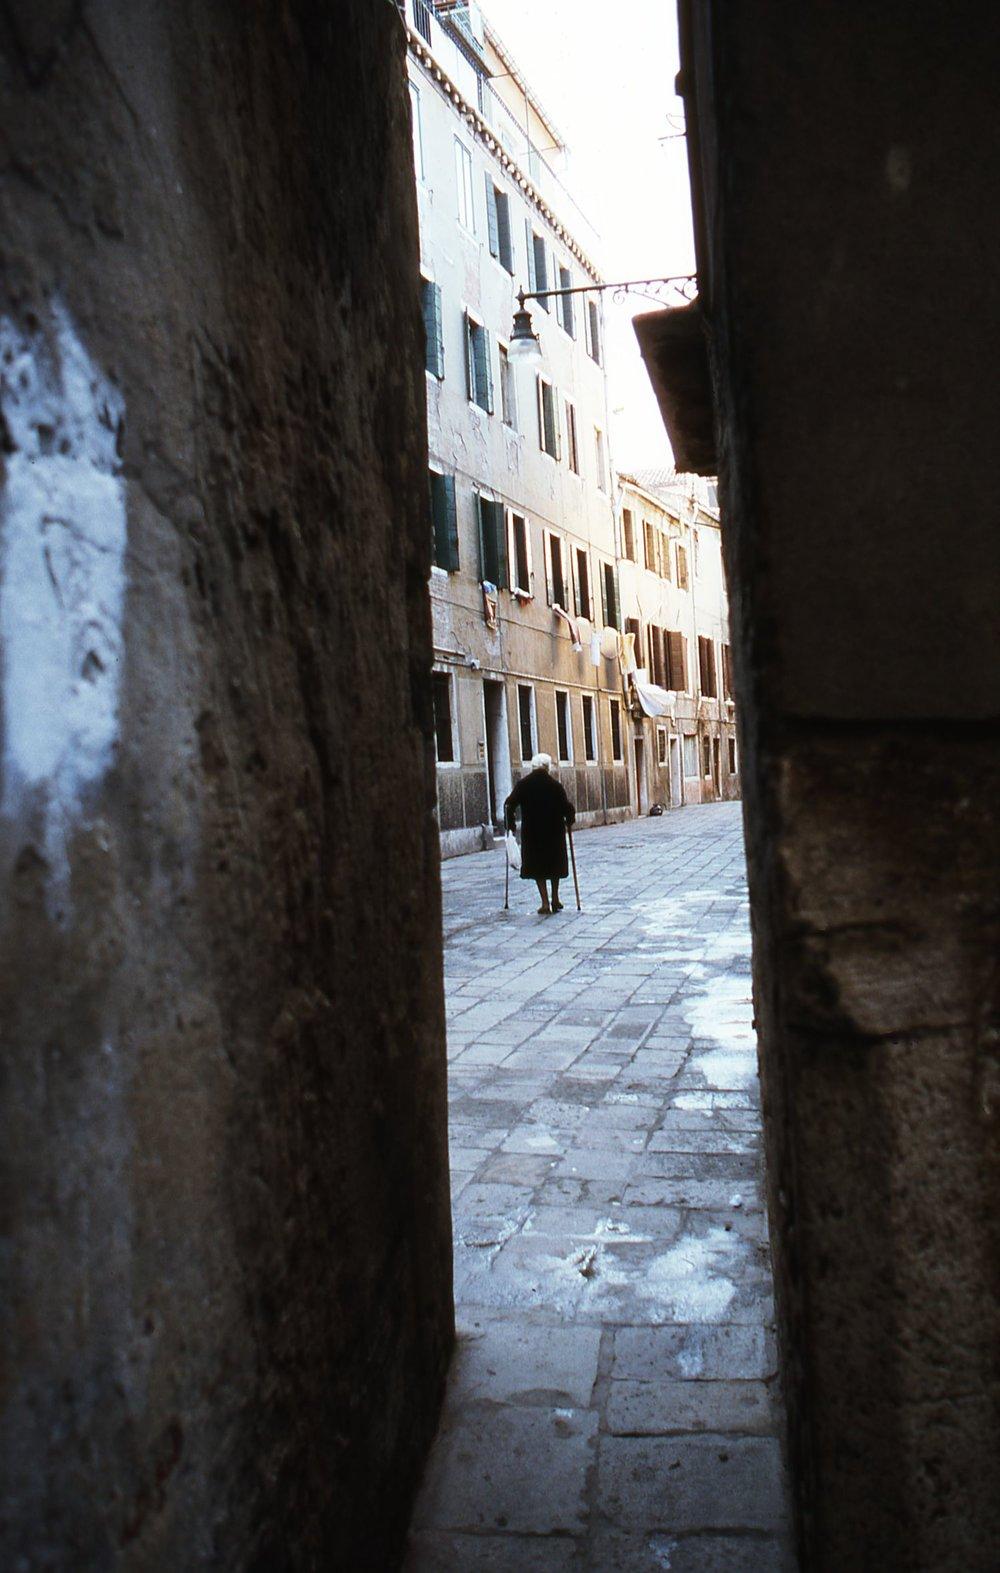 Venice | Alone in Venice | photo sandrine cohen